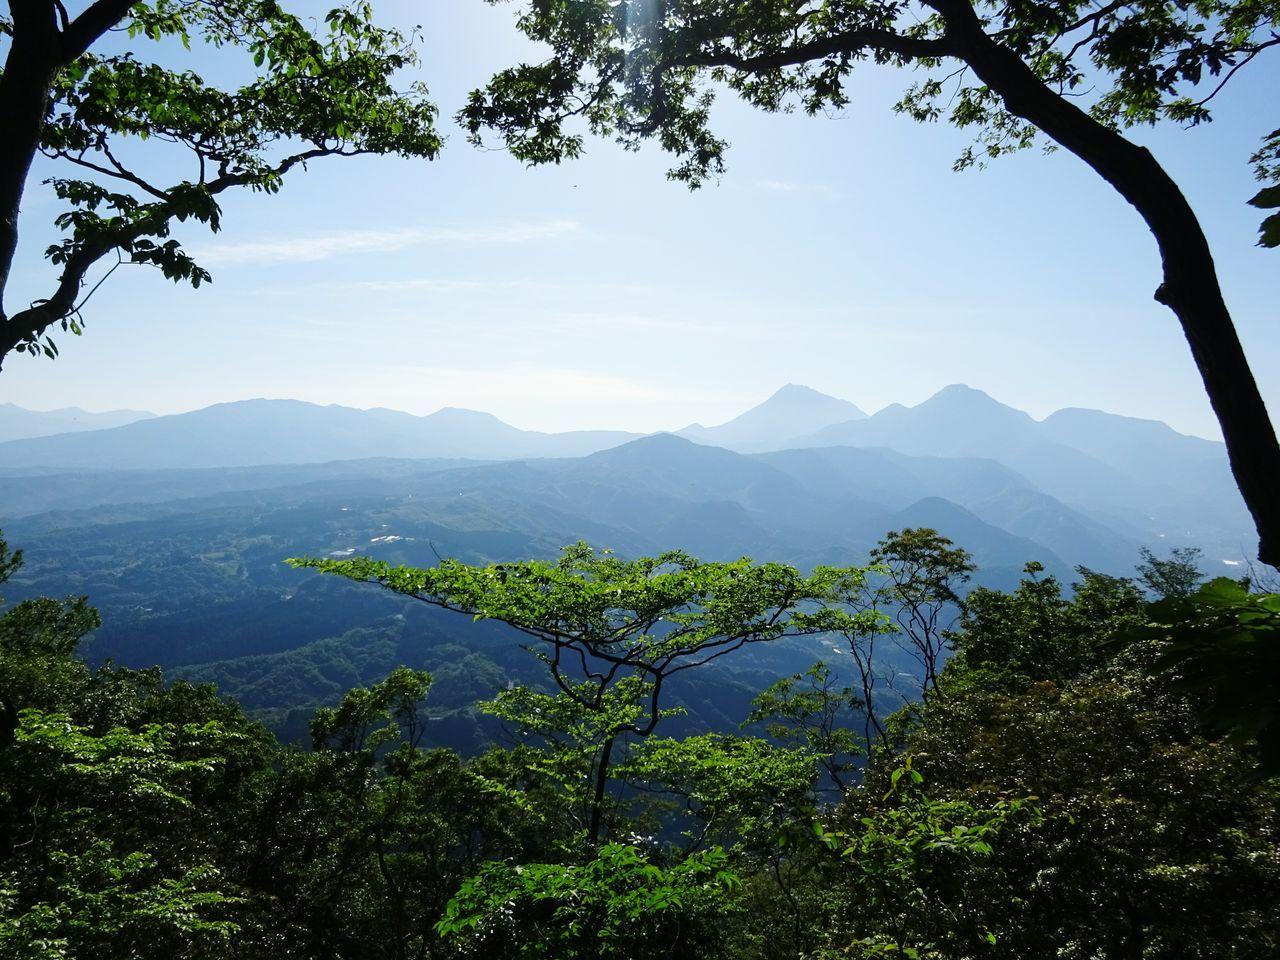 Mt Takasaki Beppu Nature Hiking Landscape_photography EyeEm Nature Lover Japan Mountains Out In The Wild EyeEm Best Shots - Nature Nature Photography Landscape_Collection KYUSHU Fresh Air